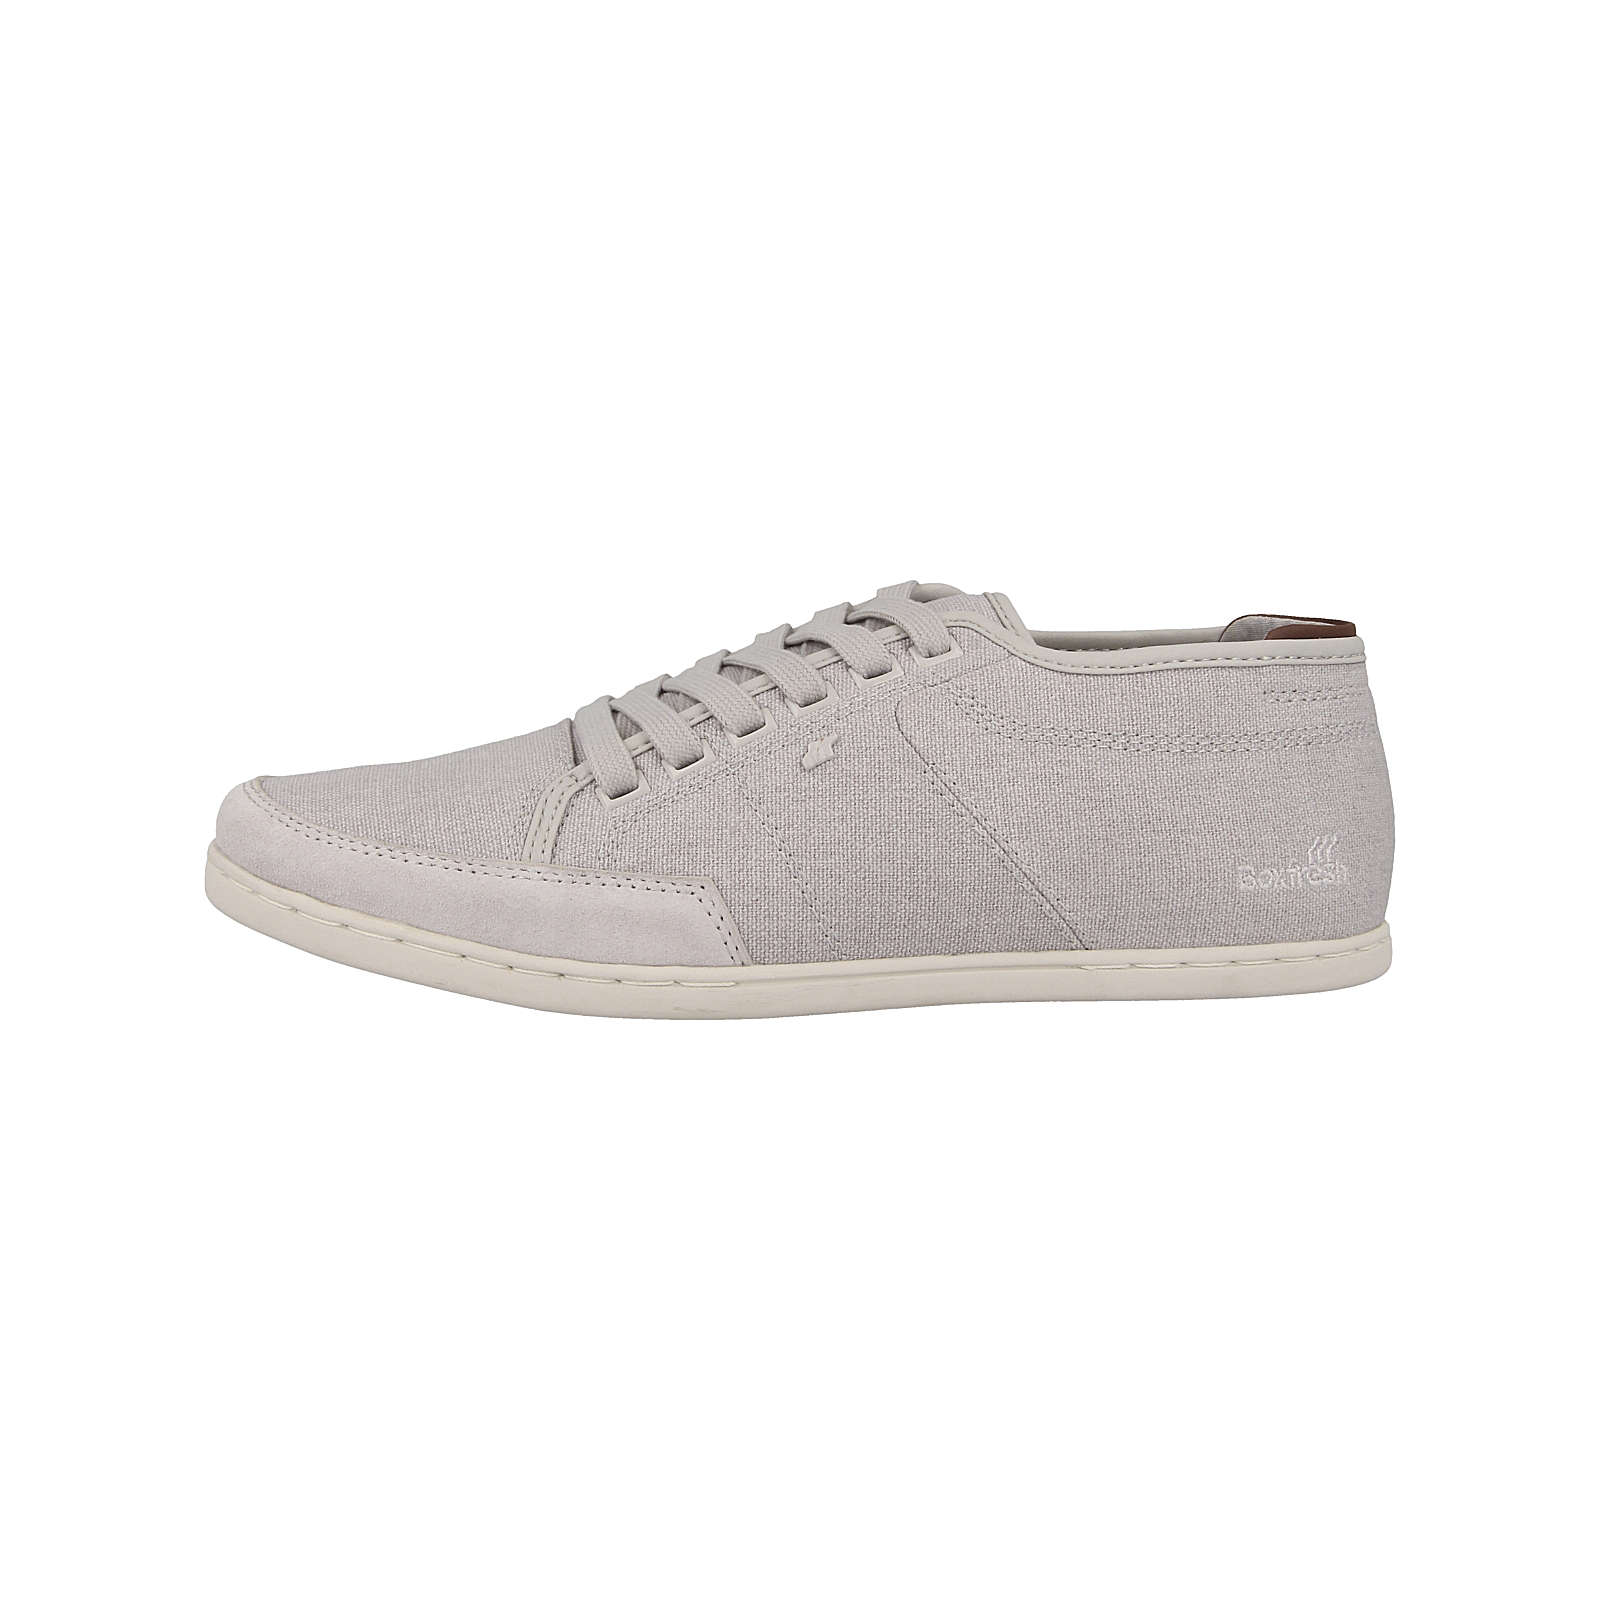 Boxfresh® Sneakers Low Sparko SH grau Herren Gr. 42